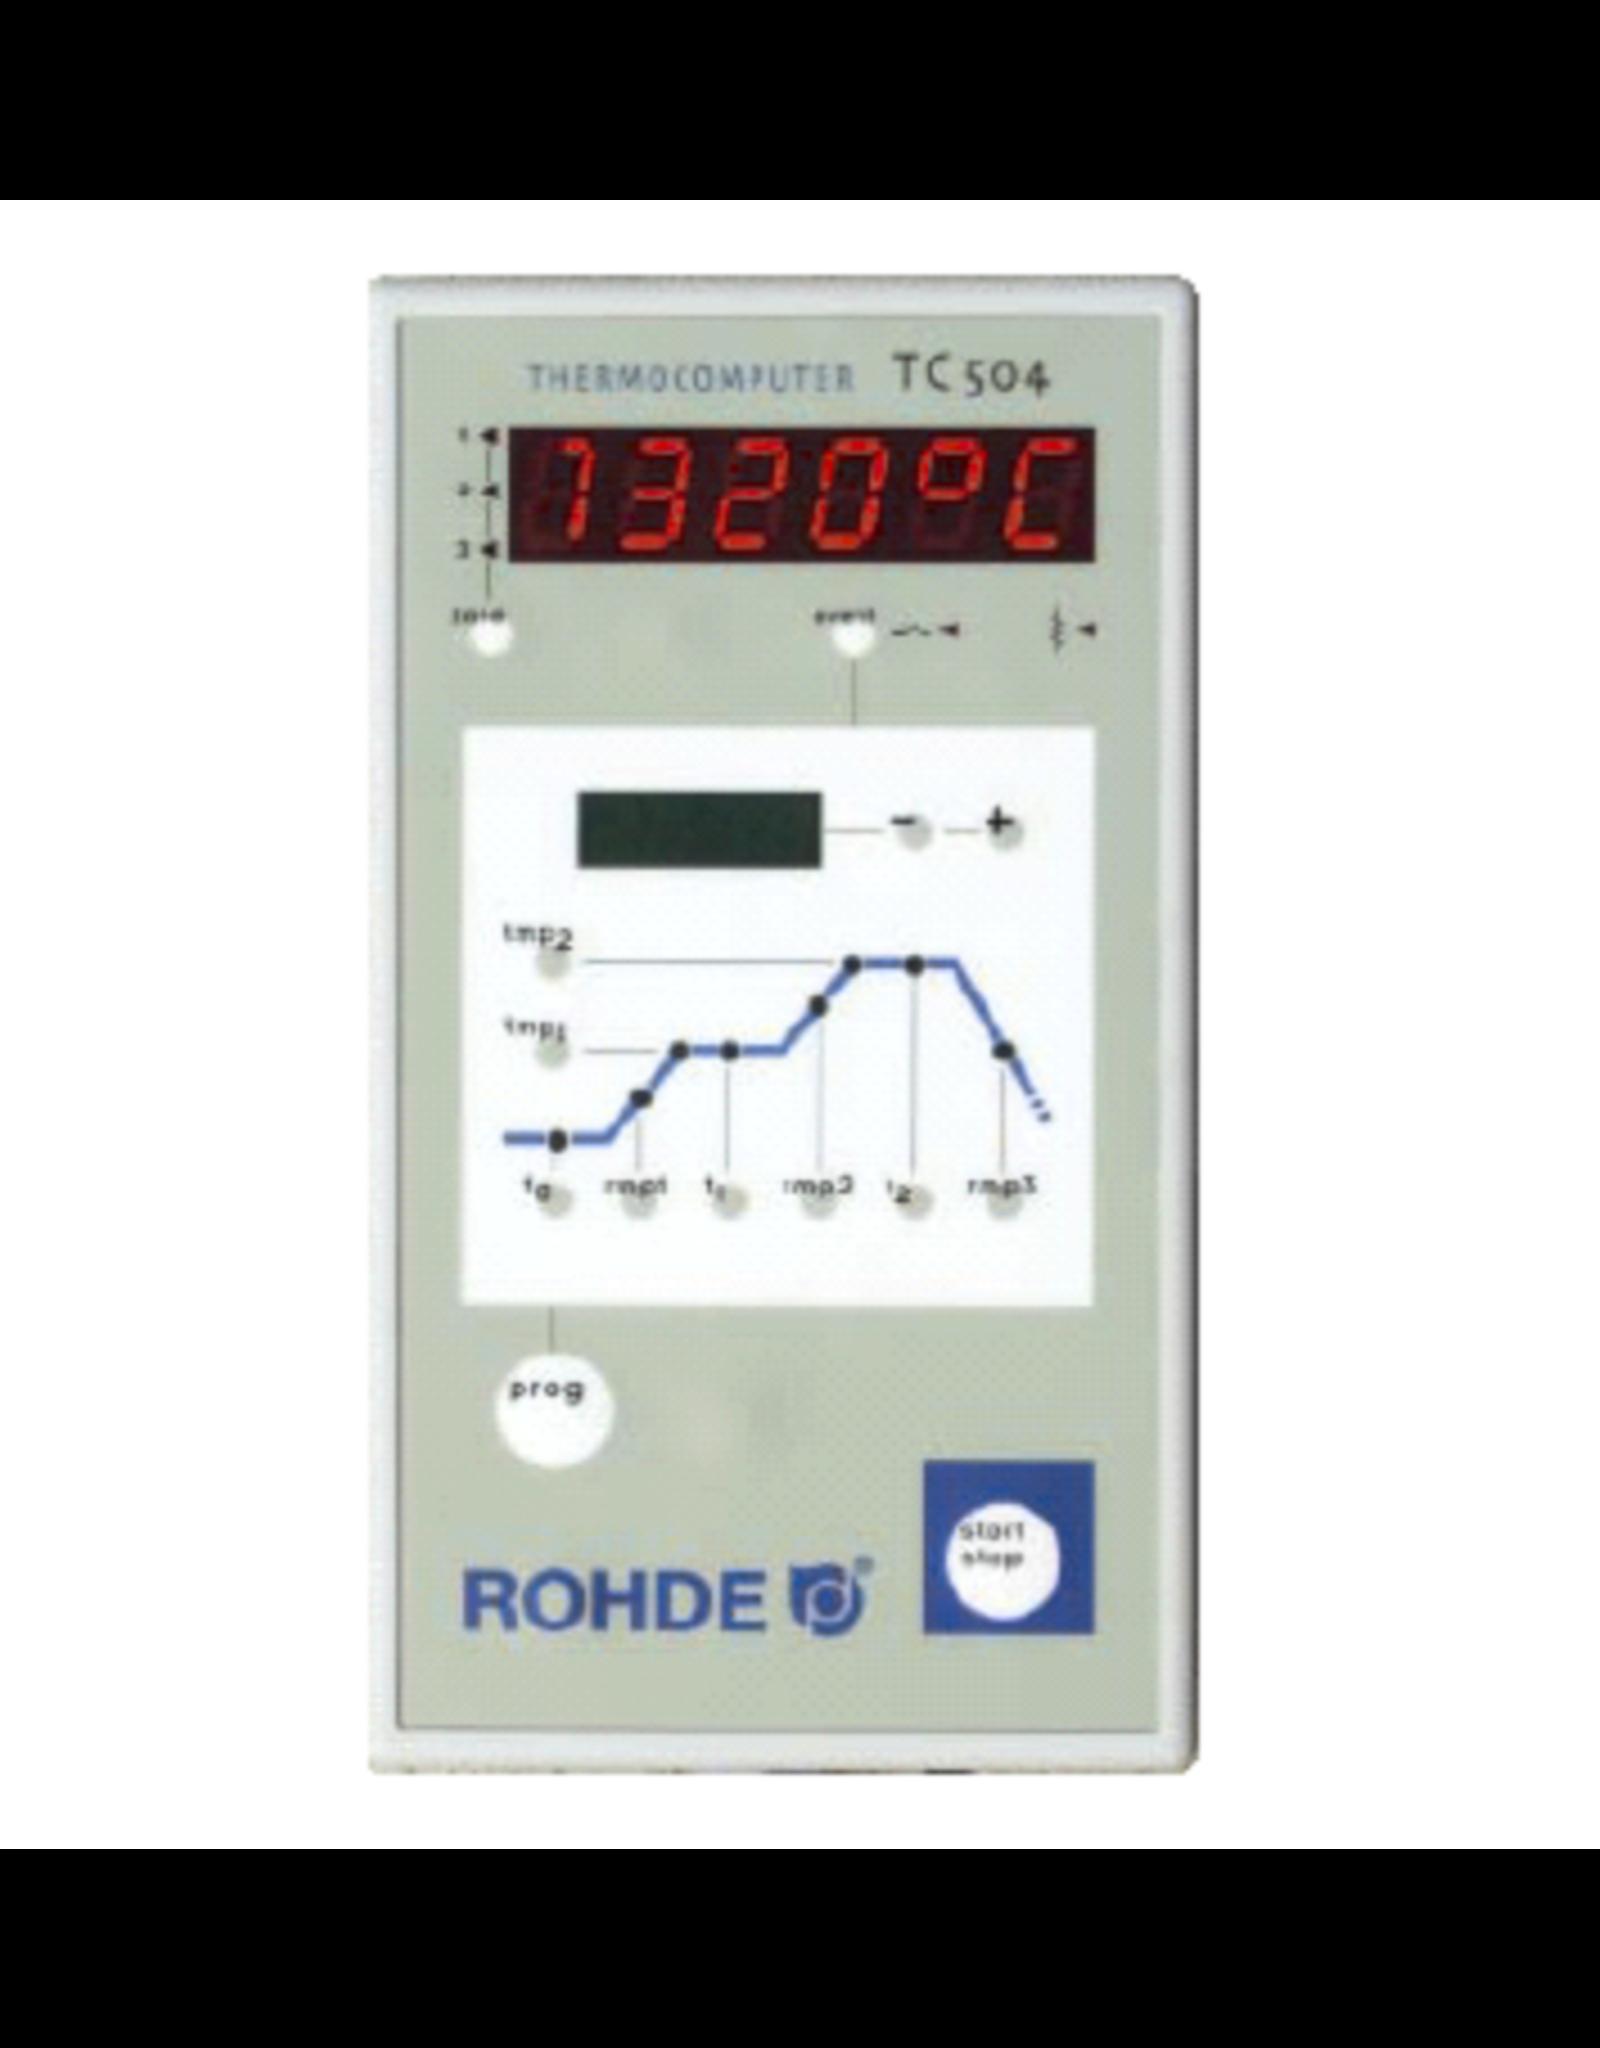 Rohde TC504 Controller option